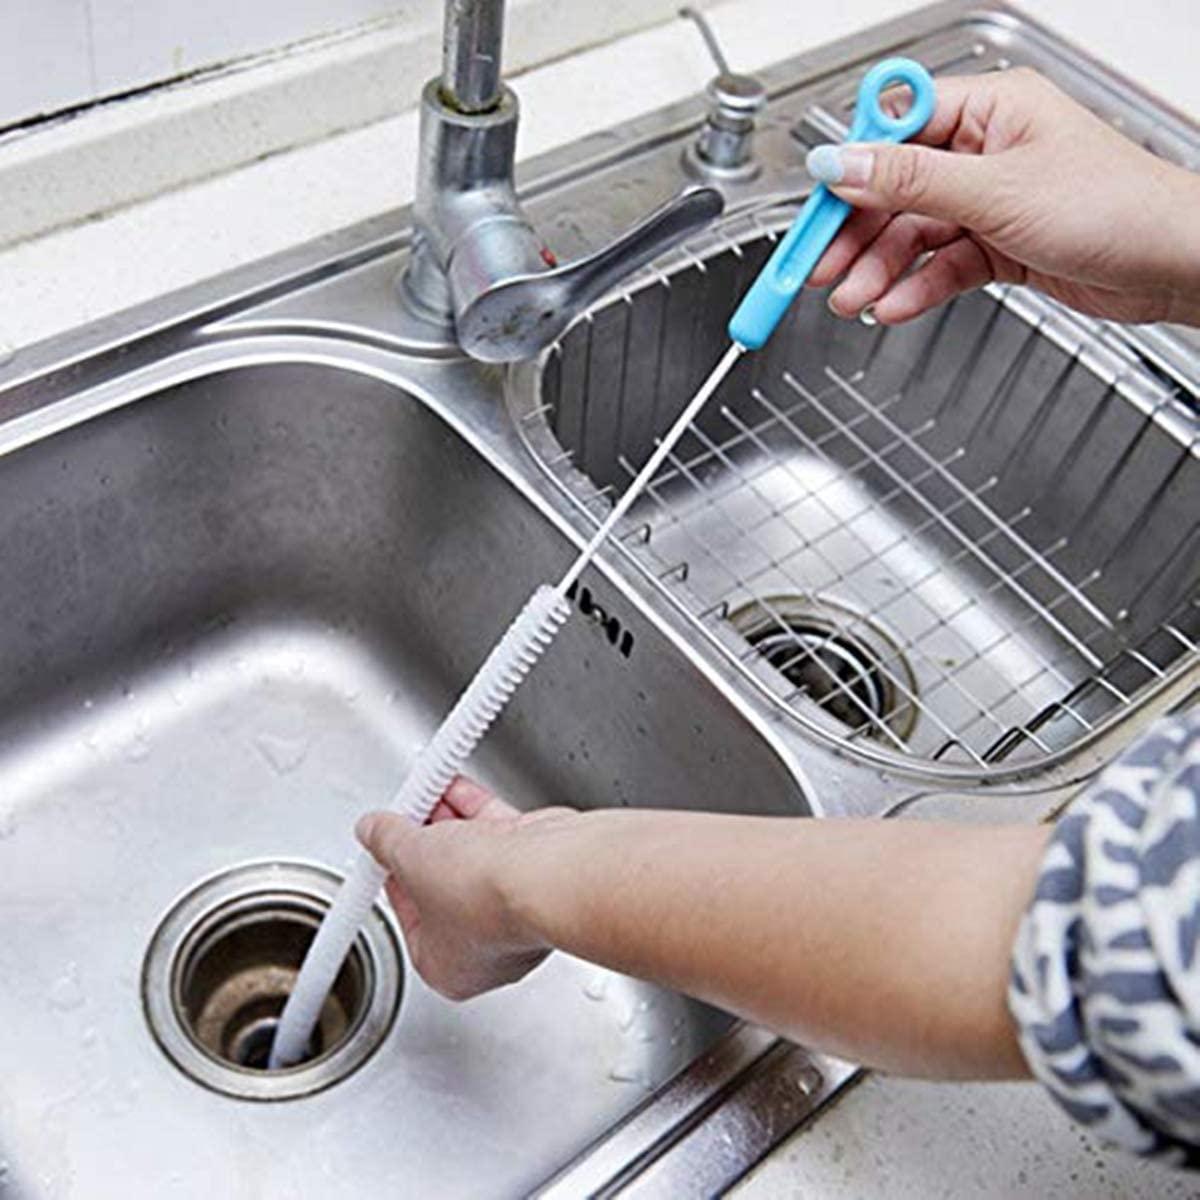 wcly Drain Snake Brush,Drain Brush for a Sink Drain,28 inch(71cm) Bendable Home Sink Tub Toilet Dredge Sink Drain Clog Brush,2PCS